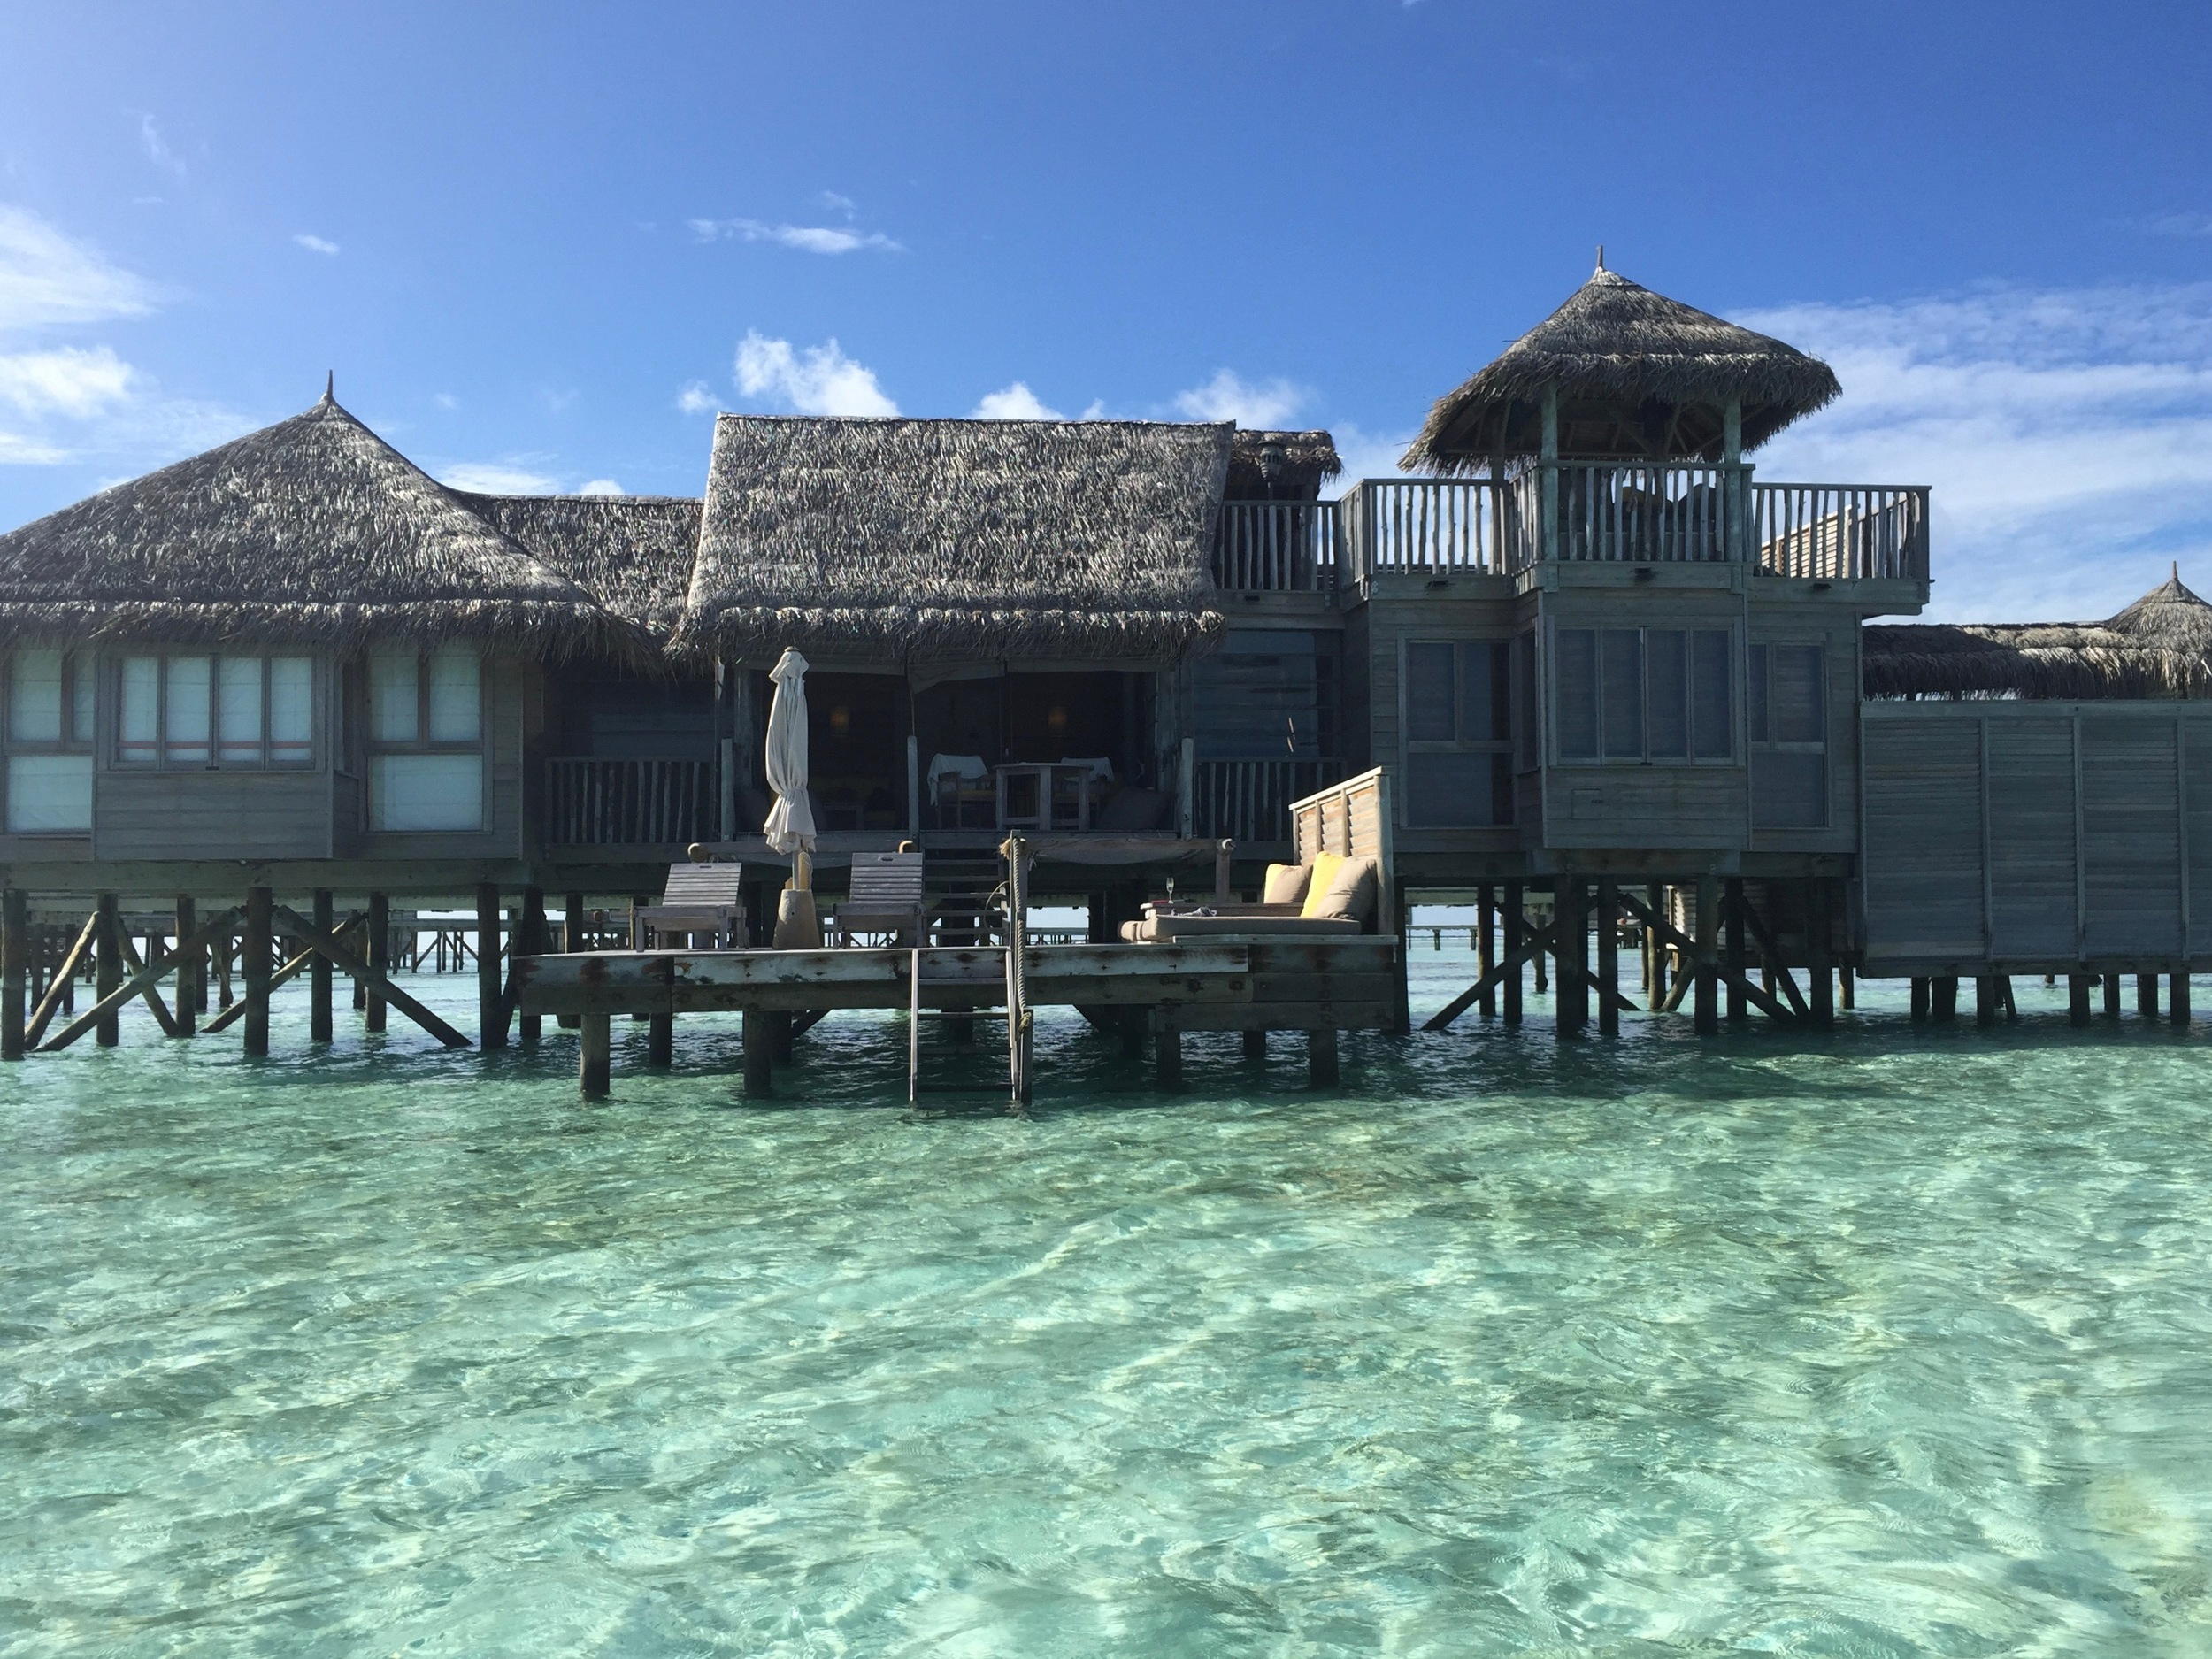 You backyard in the Maldives